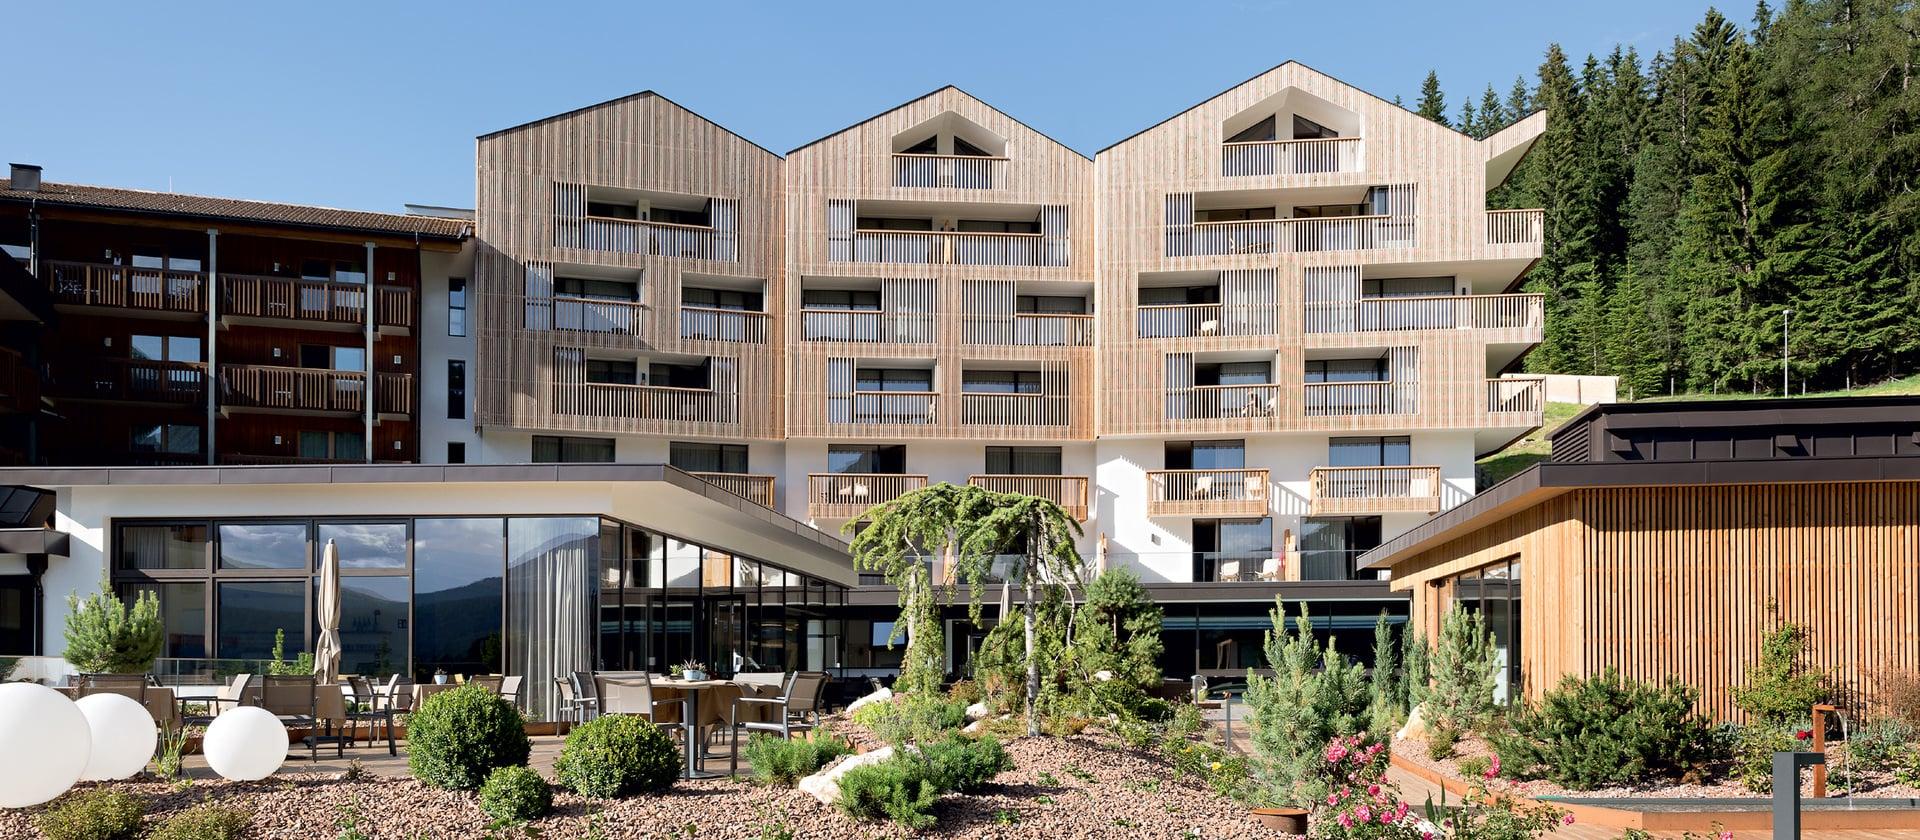 Hotel Cristal in Obereggen